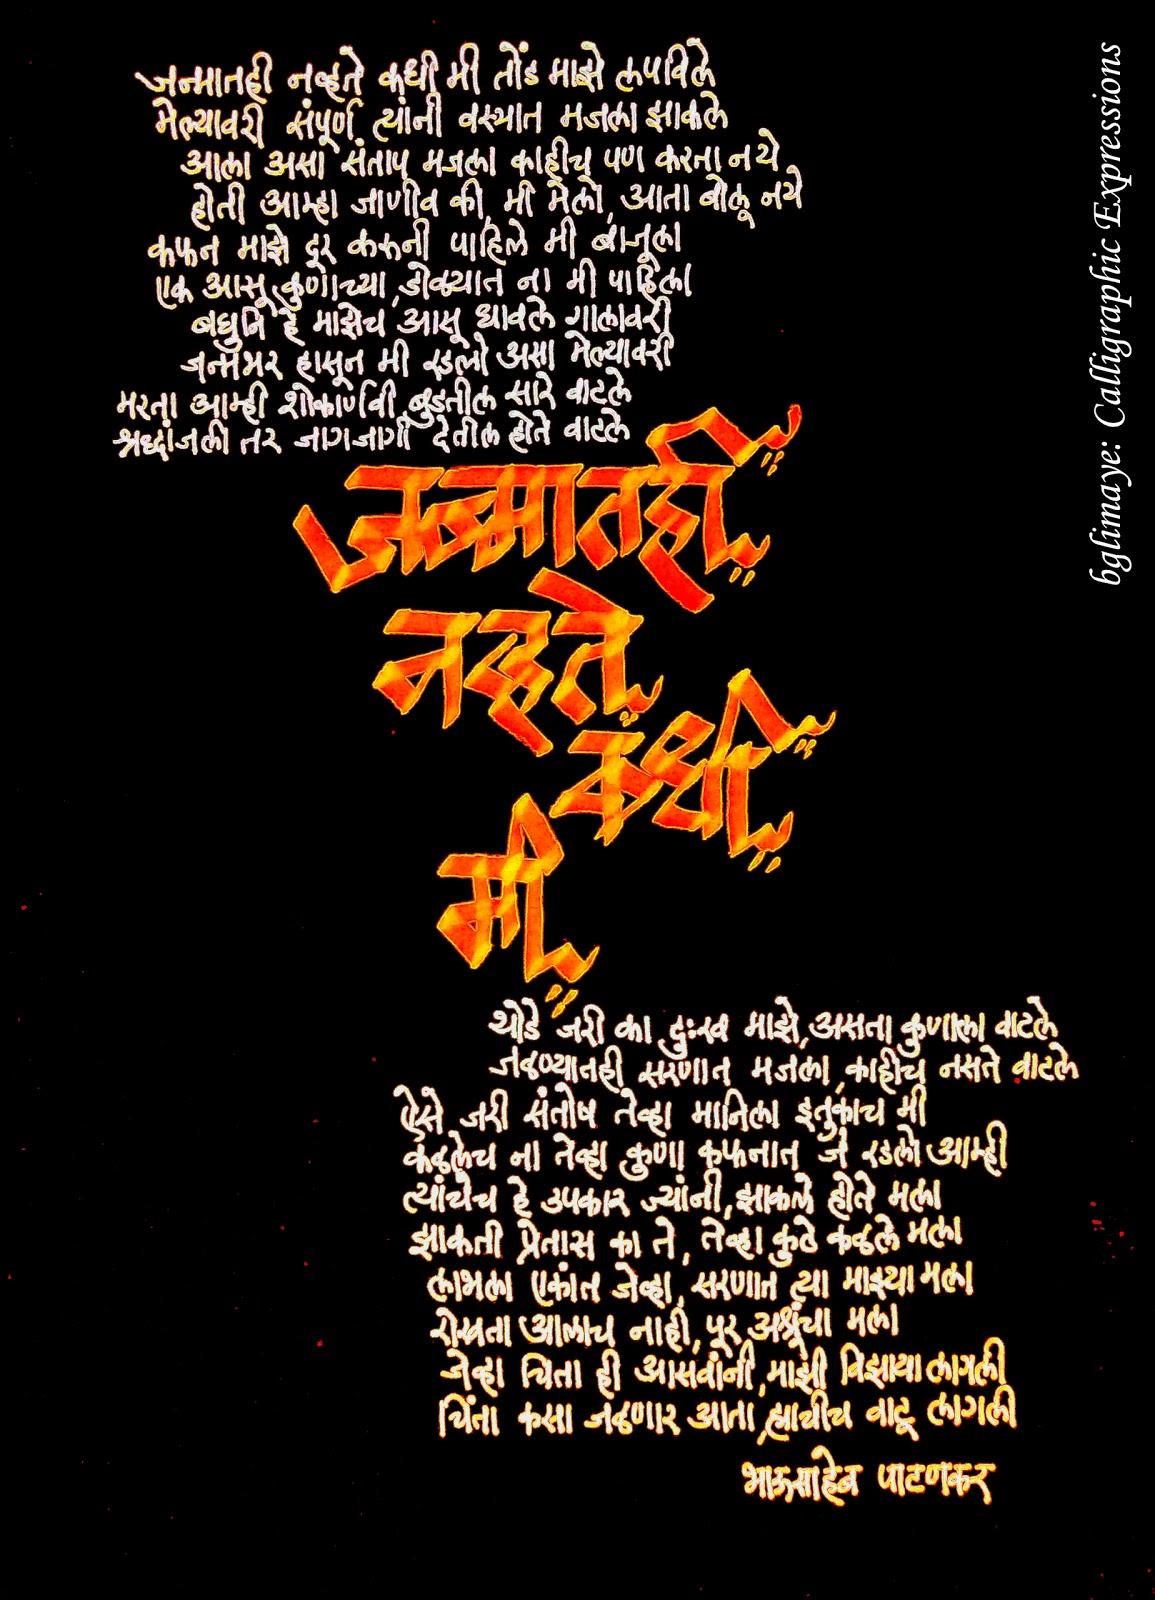 Late Indira Sant Marathi Poem | Literature | Pinterest | Poem